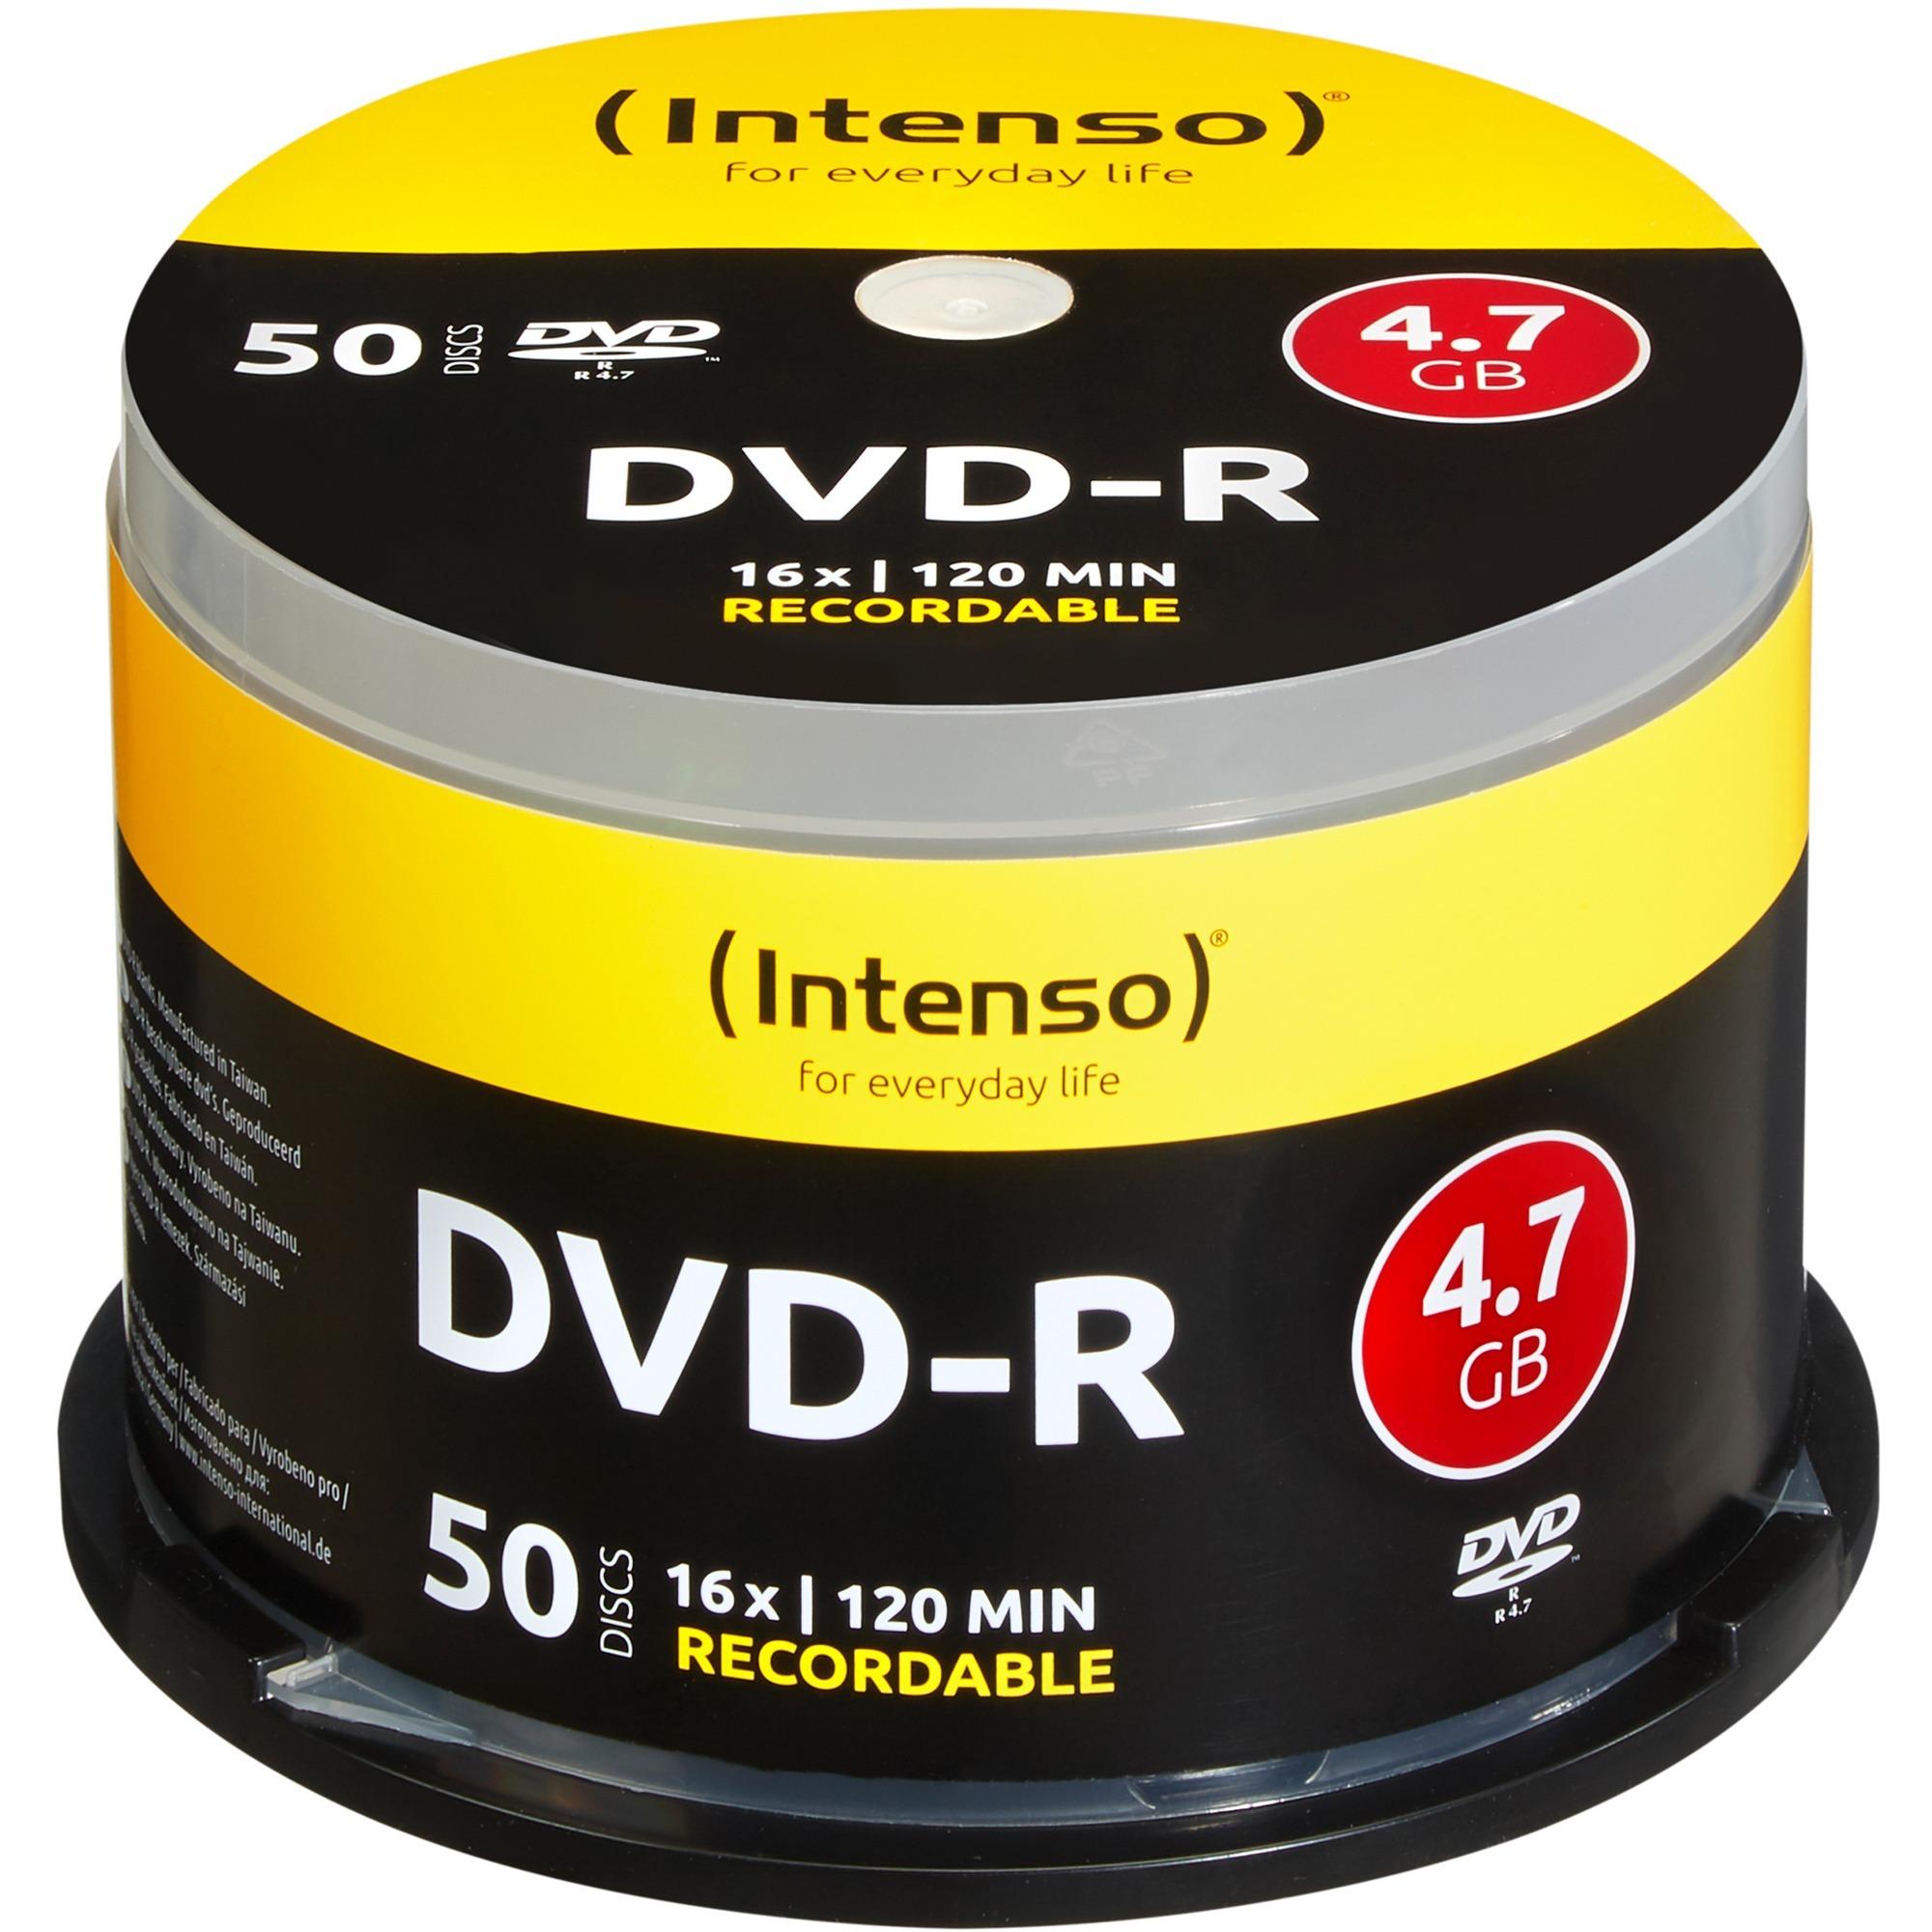 DVD-R 4.7GB, 16x 4.7Go DVD-R 50pièce(s), Support vierge DVD